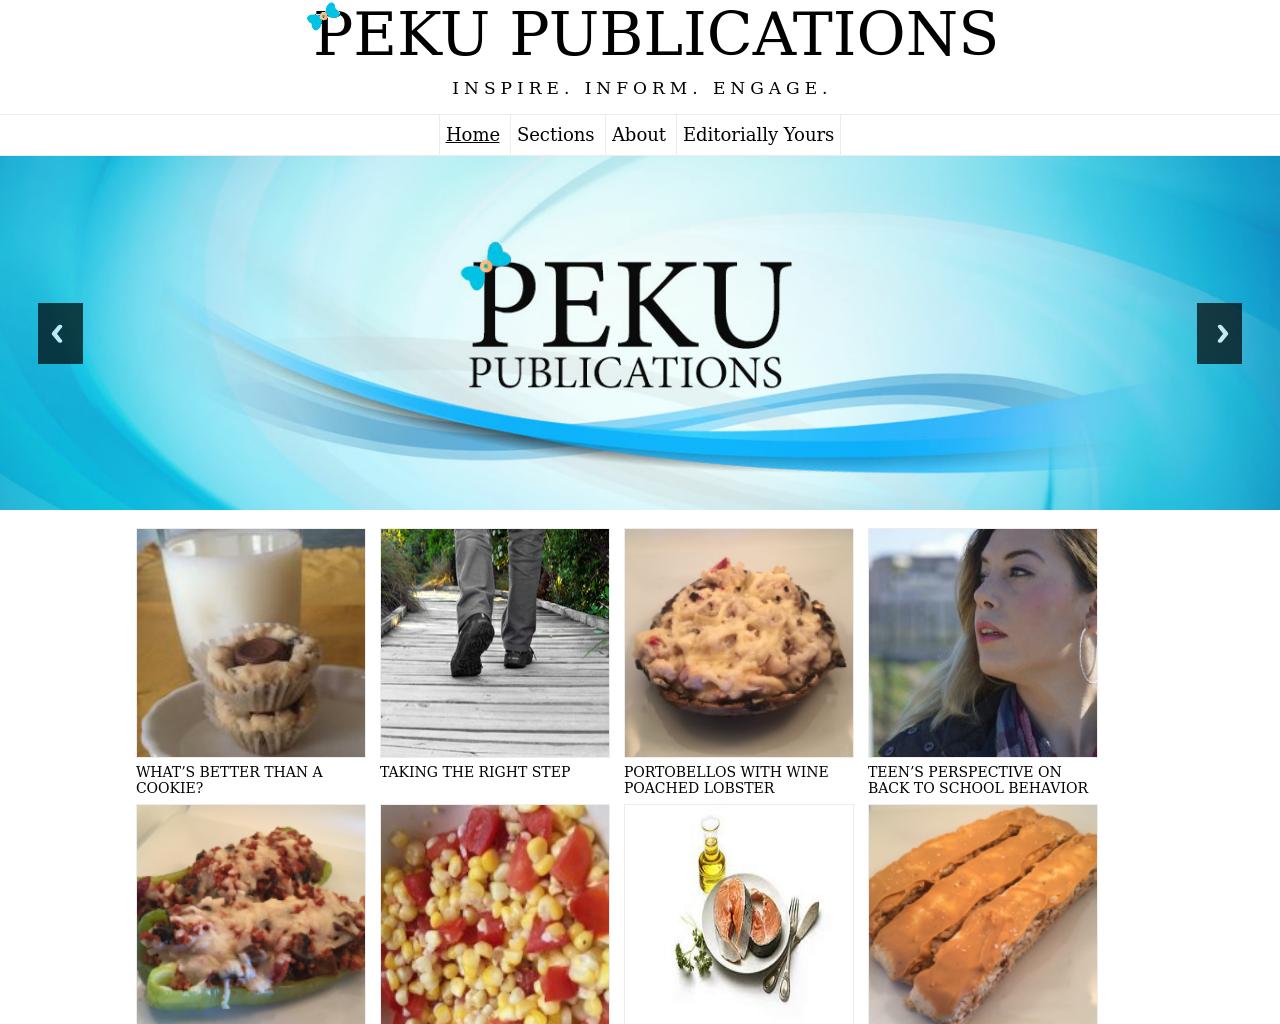 PeKu-Publications-Advertising-Reviews-Pricing